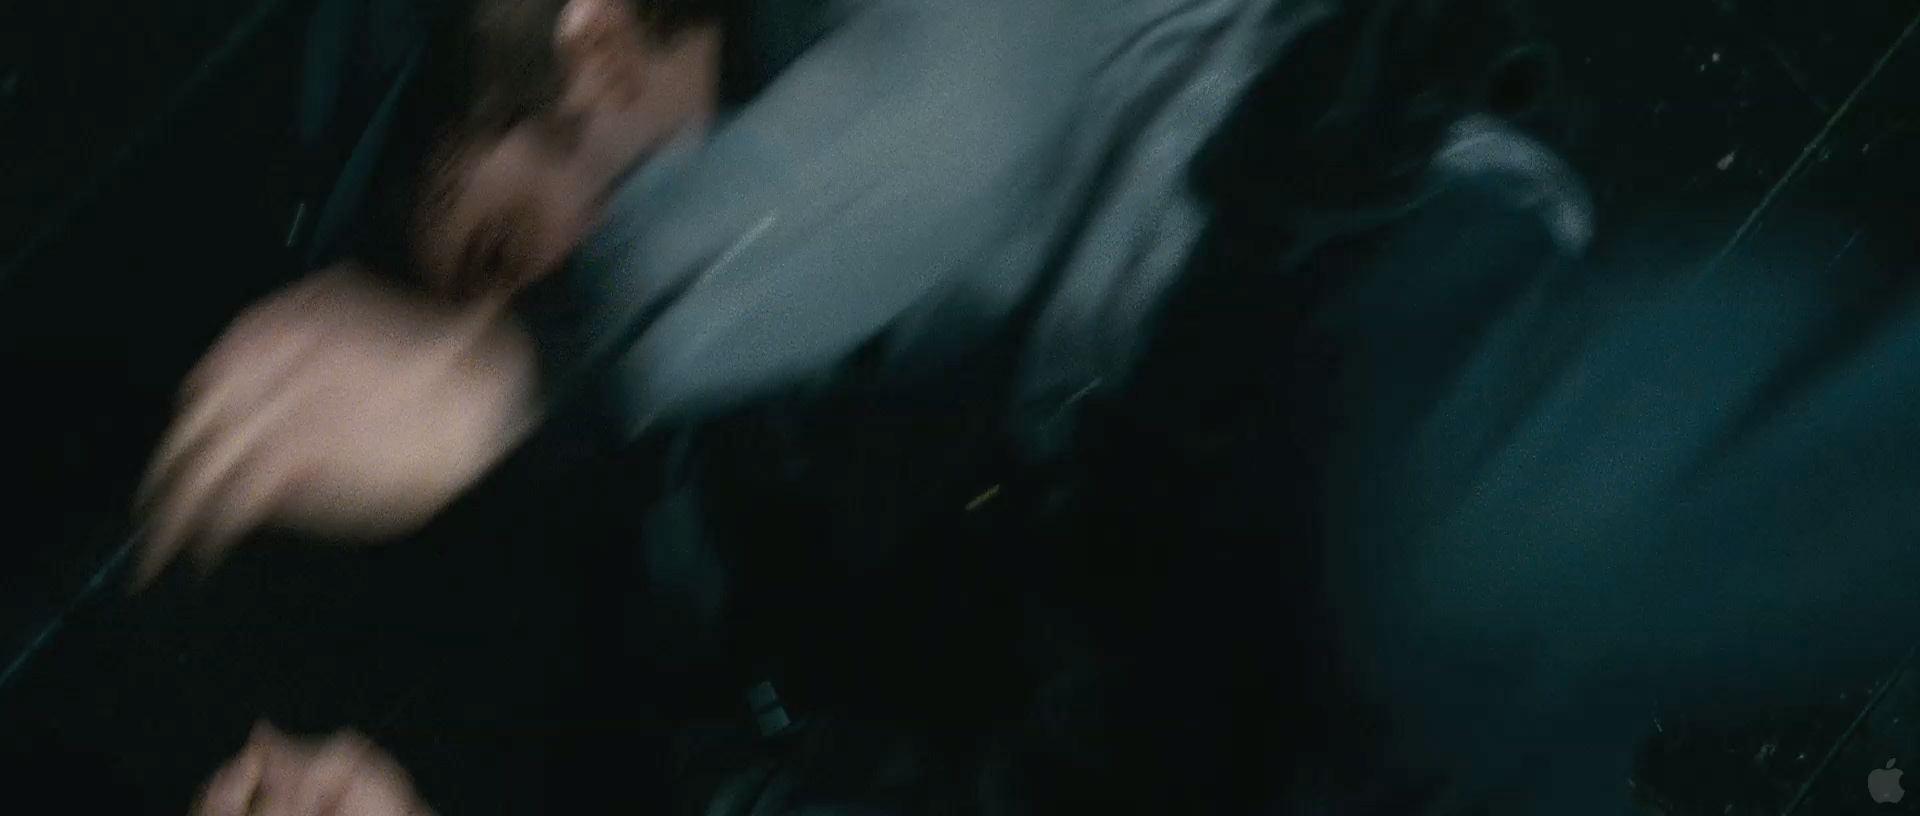 Harry Potter BlogHogwarts HP7 2 Trailer 14